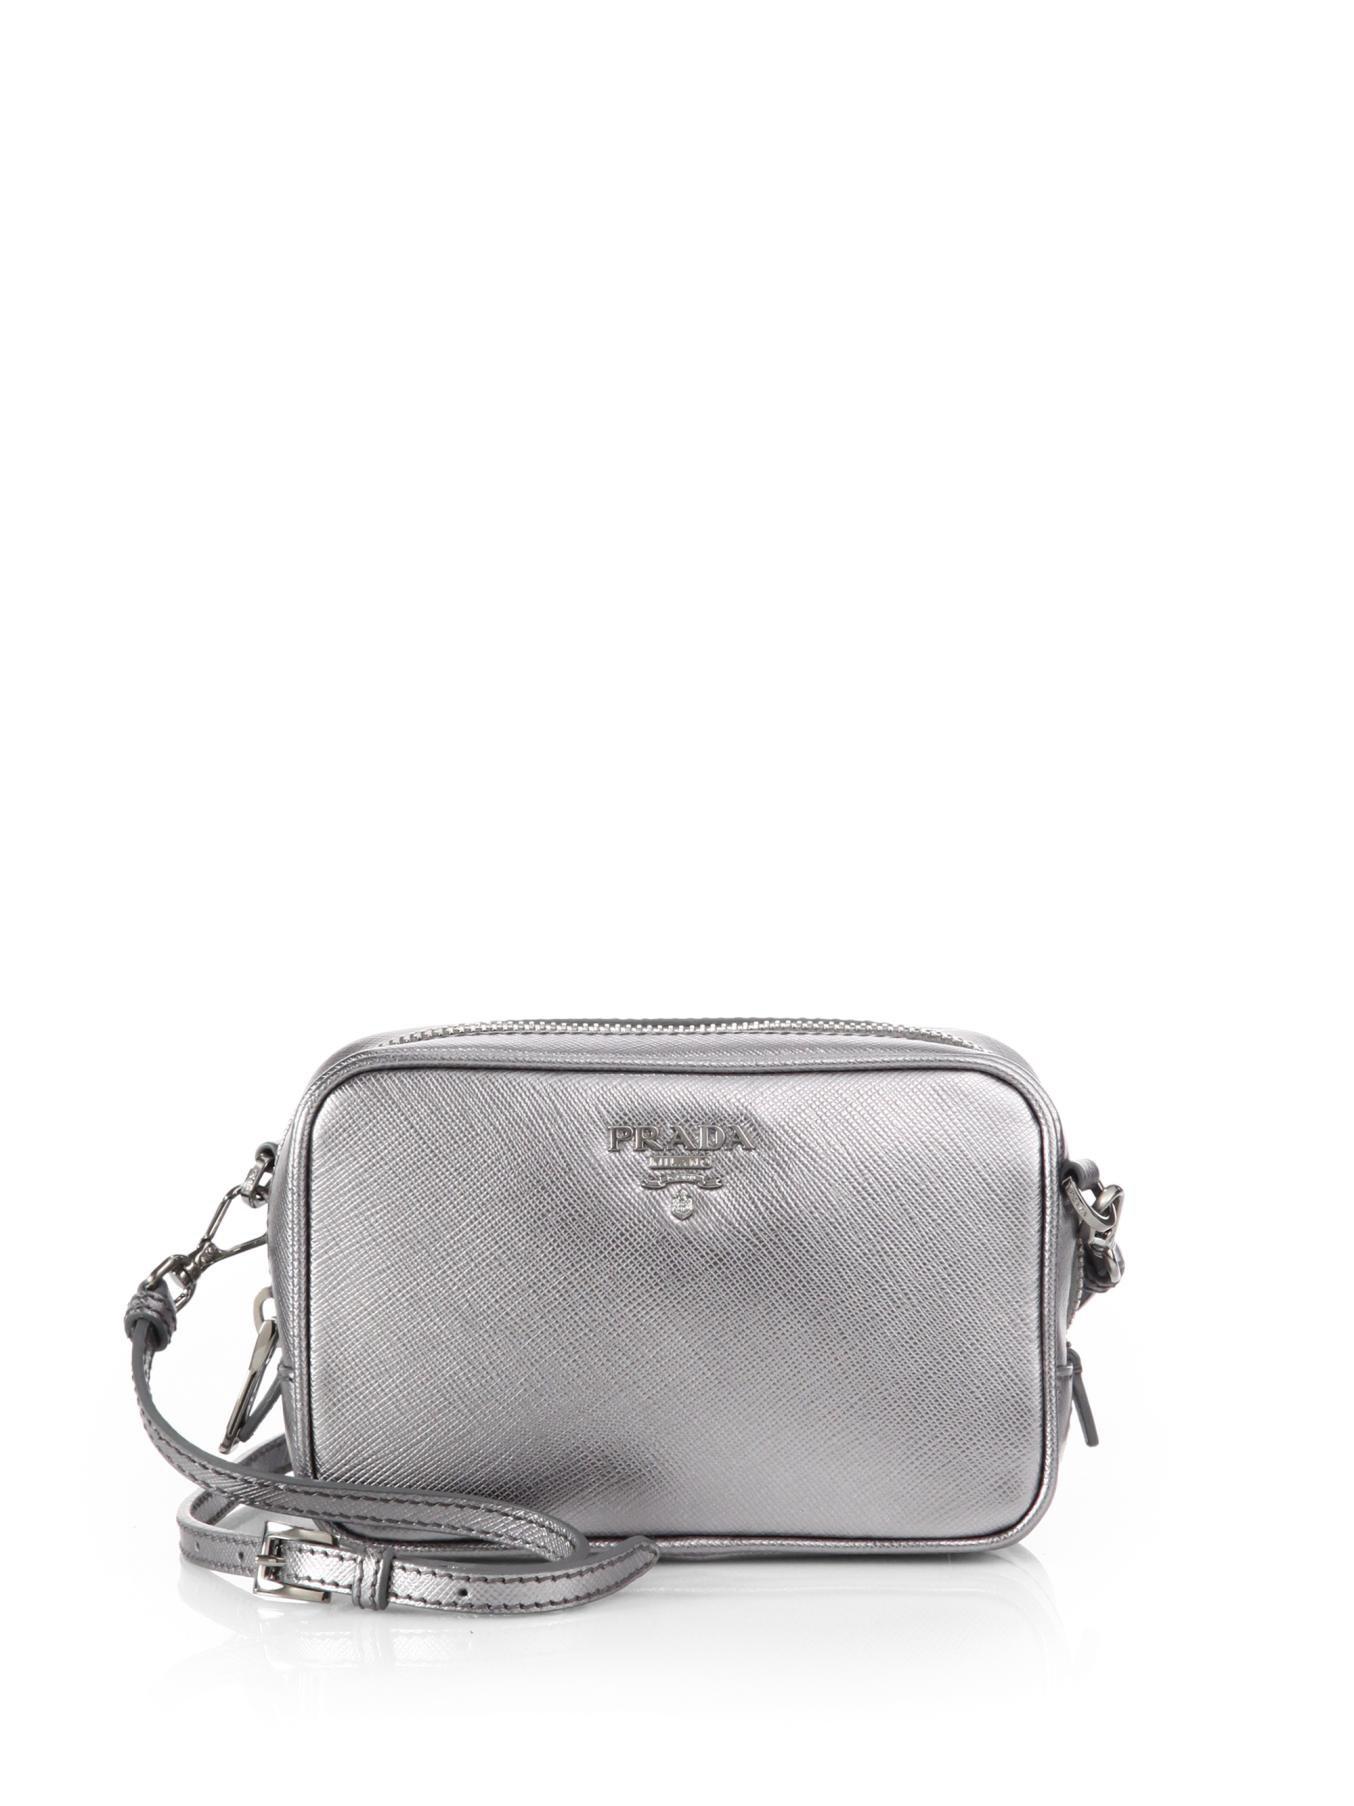 ... new zealand lyst prada saffiano leather camera bag in metallic 49578  5507f 7e7ce9785568e